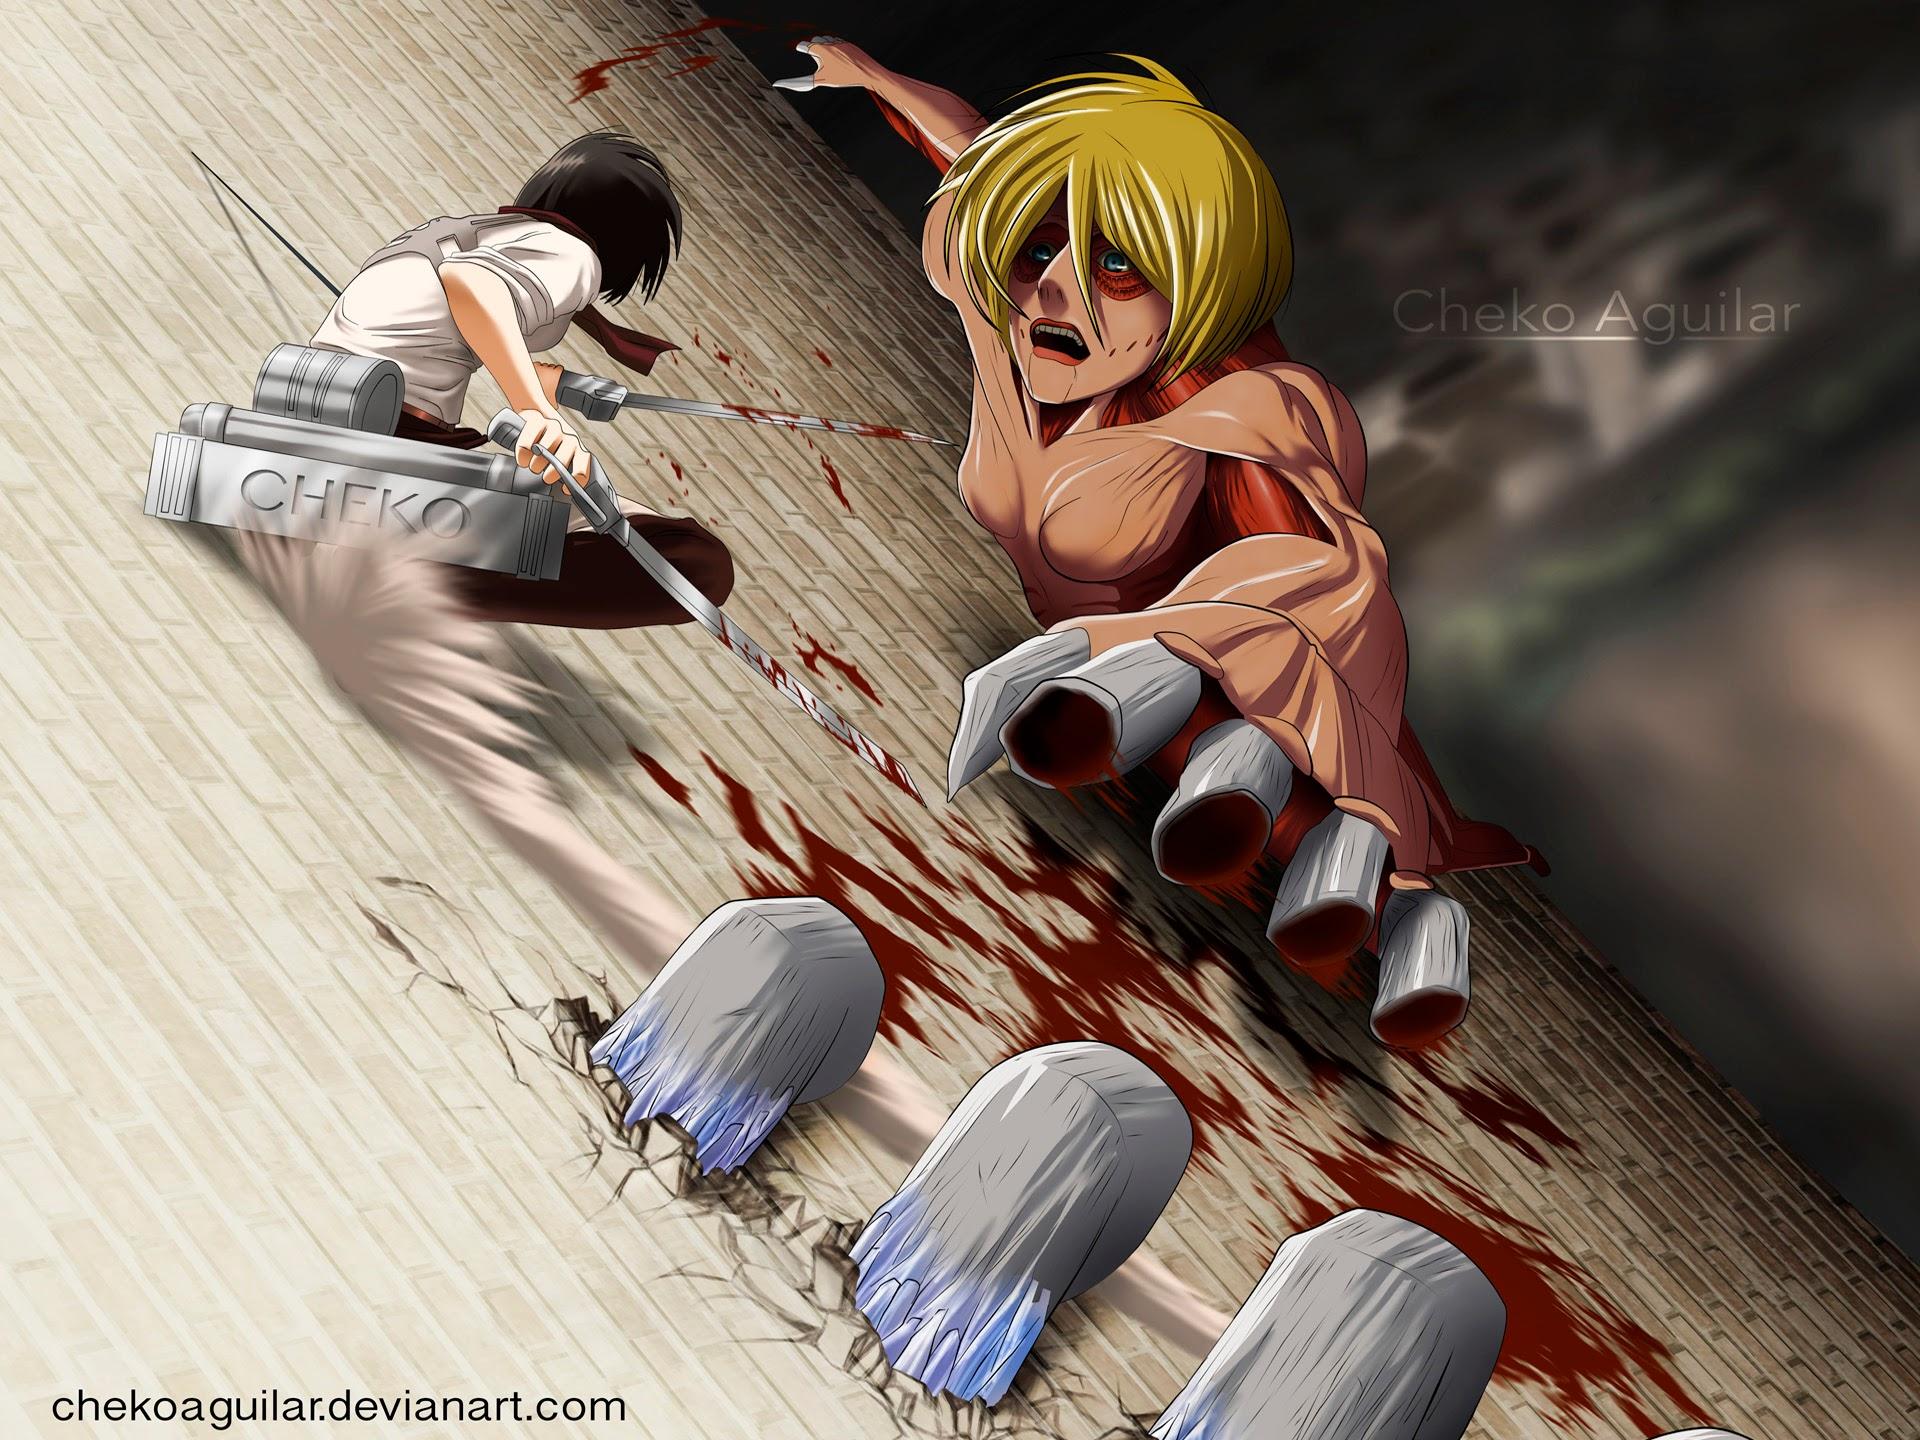 Attack on Titan Mikasa Wallpaper - WallpaperSafari